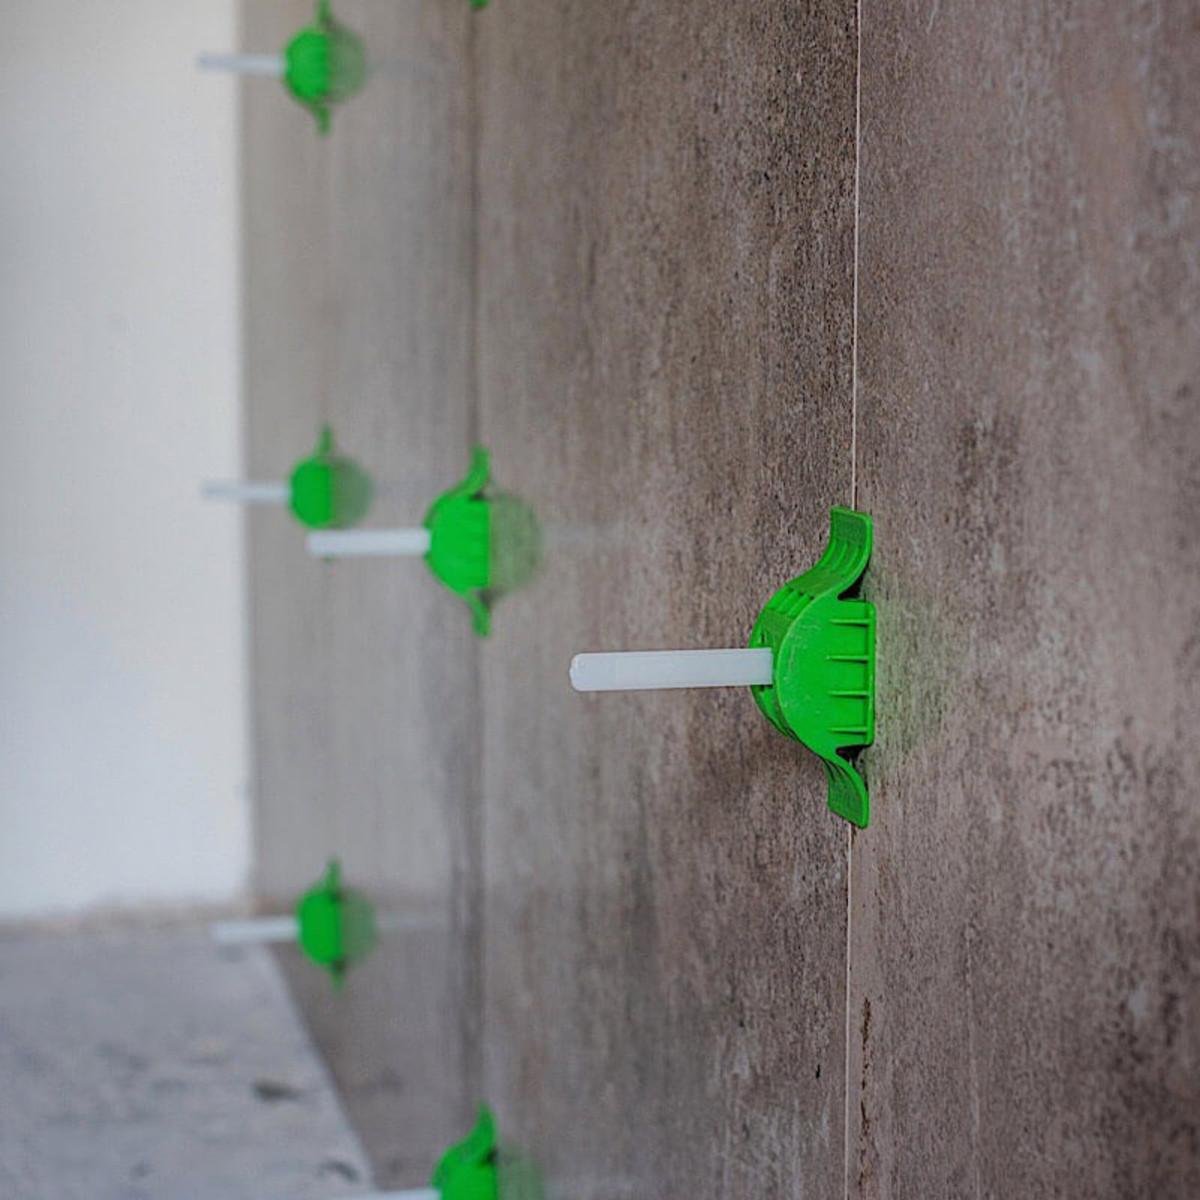 MLT Reusable Caps wall installation